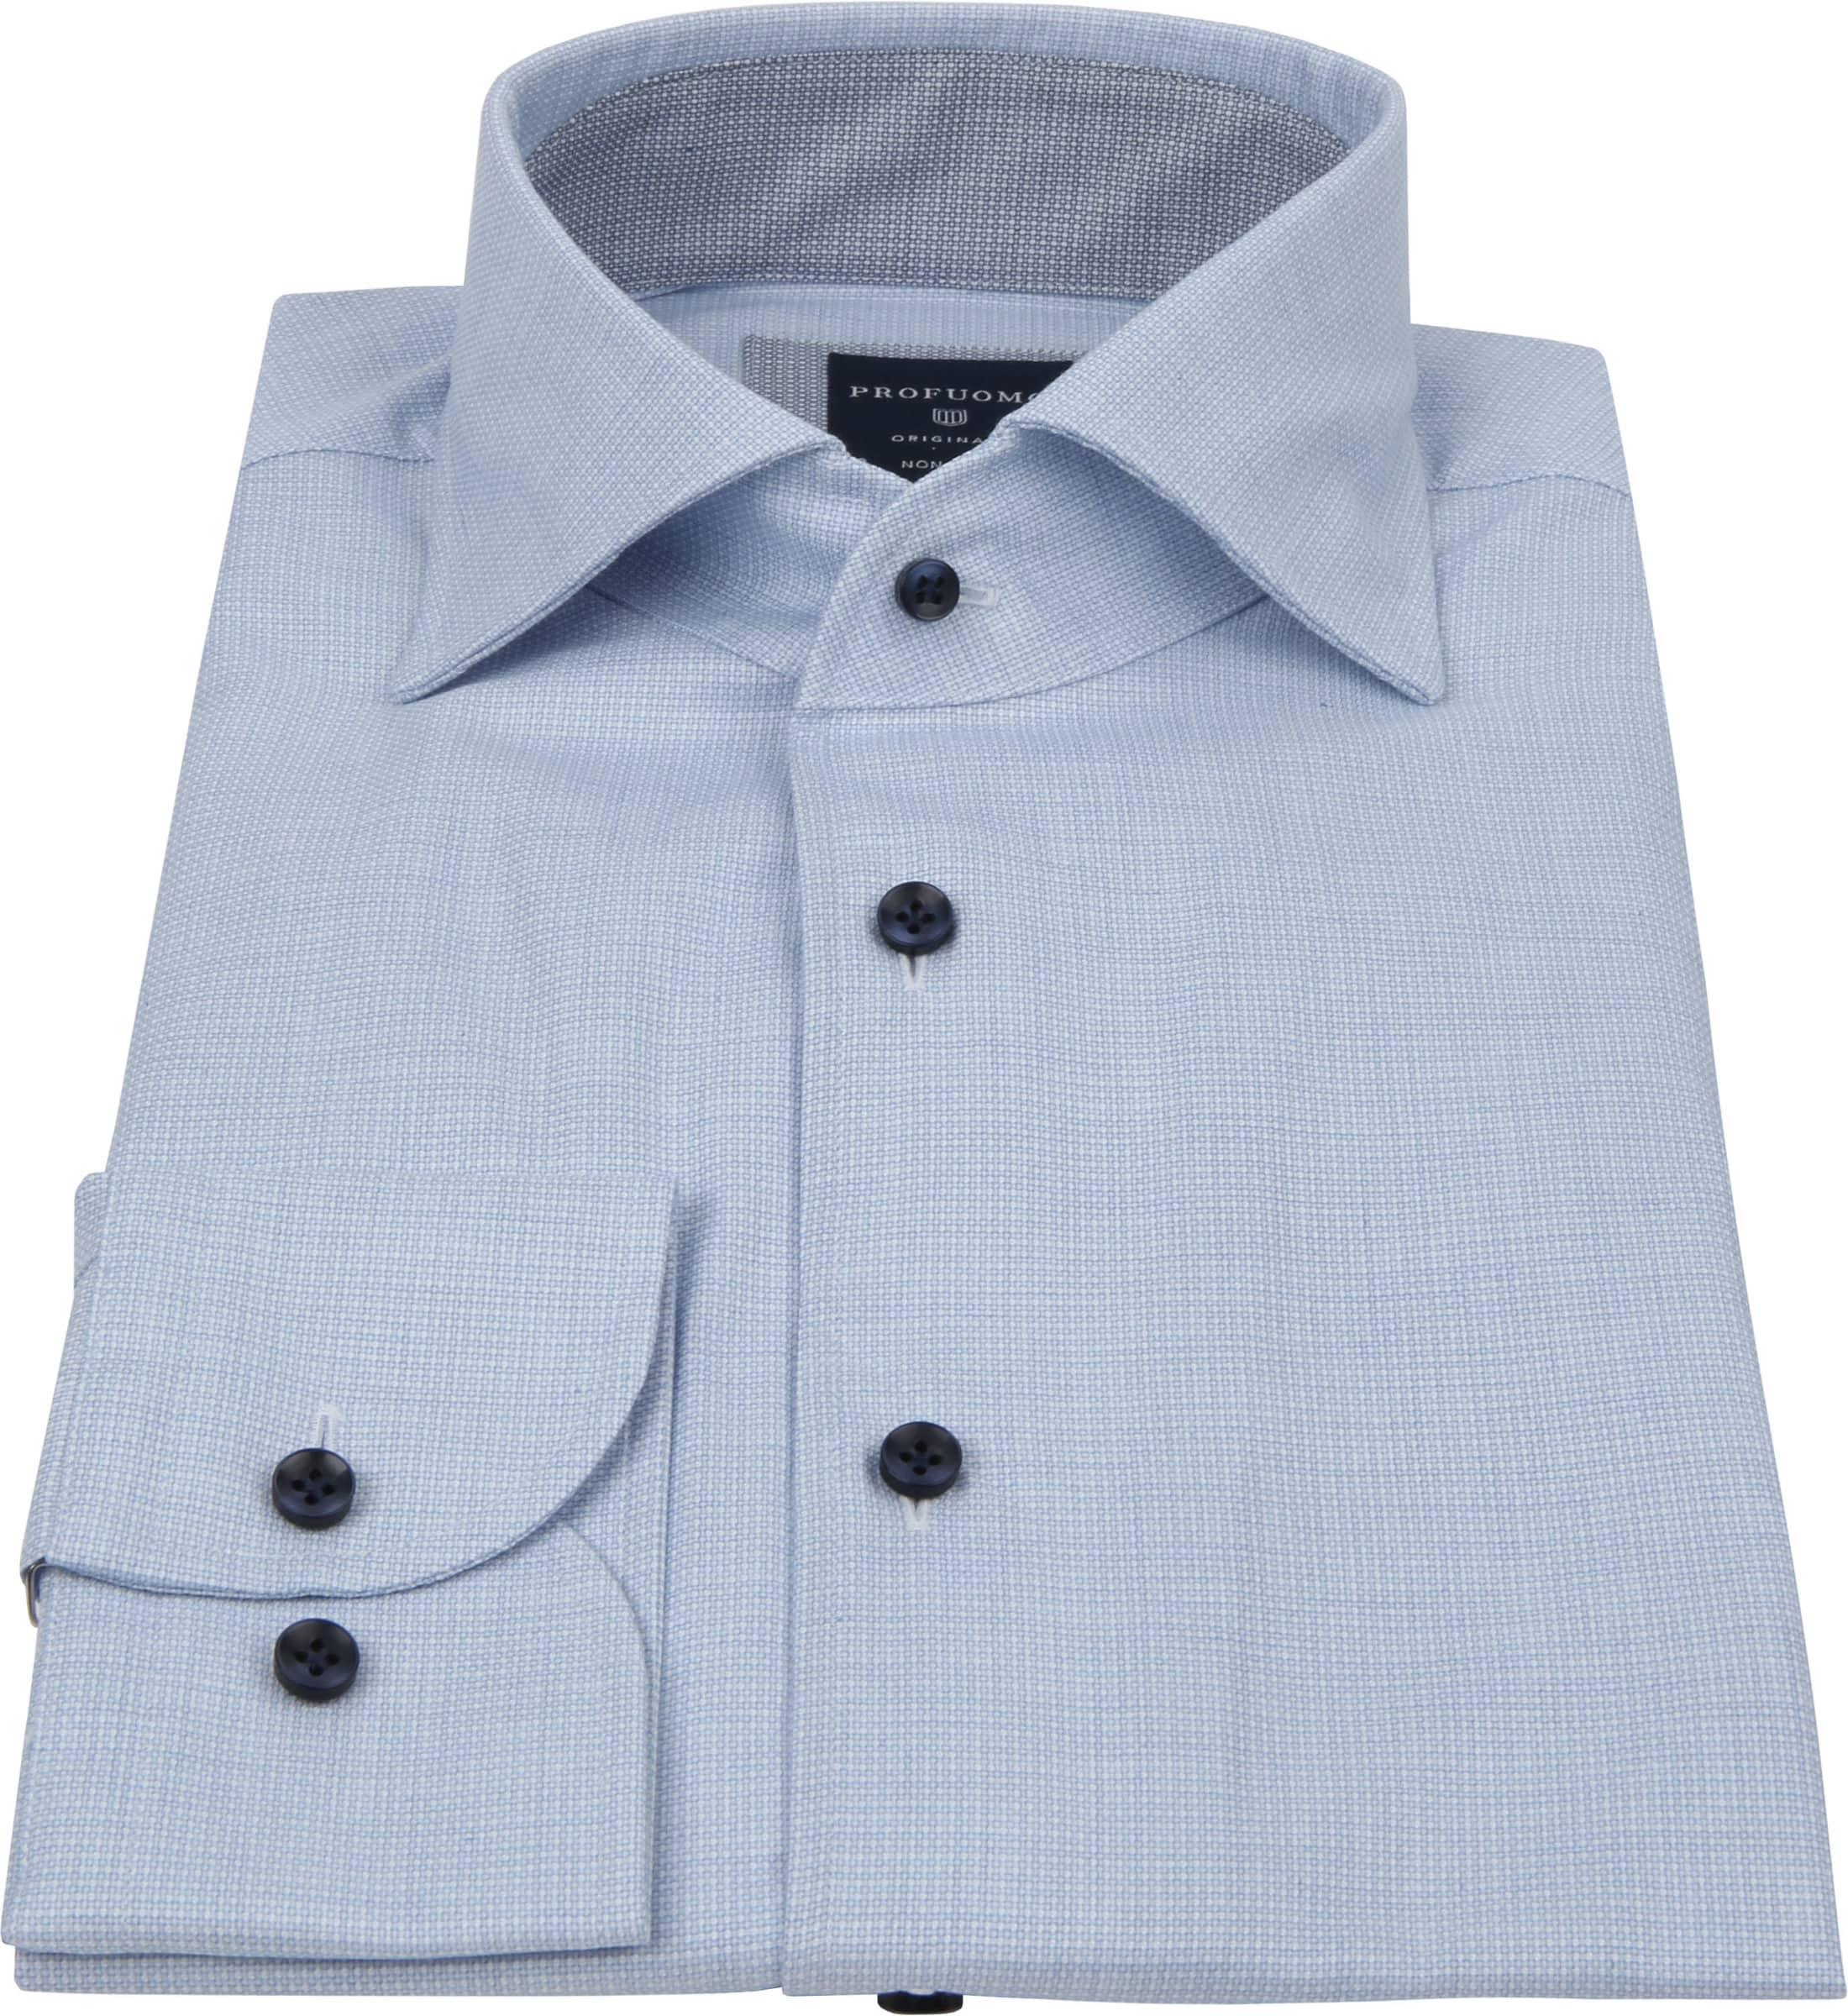 Profuomo Originale Overhemd Print Blauw